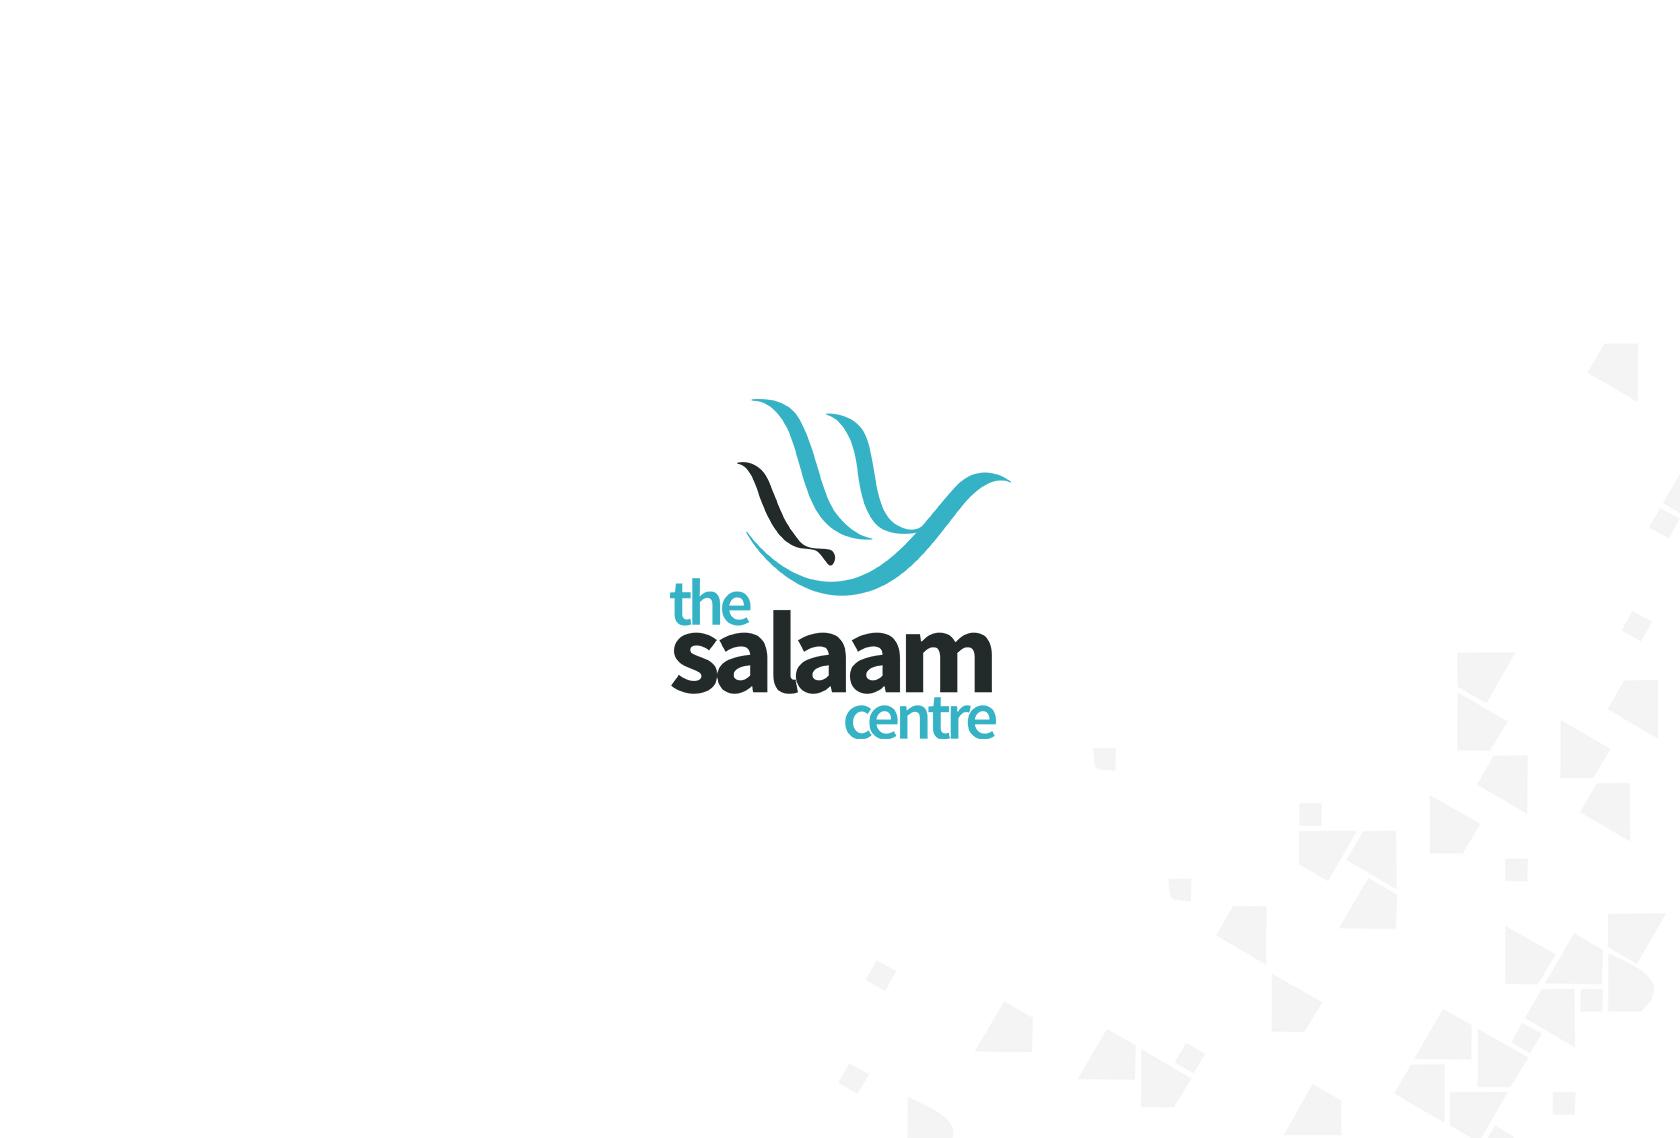 Salaam Logo White - The Salaam Centre (Branding) - Creative Digital